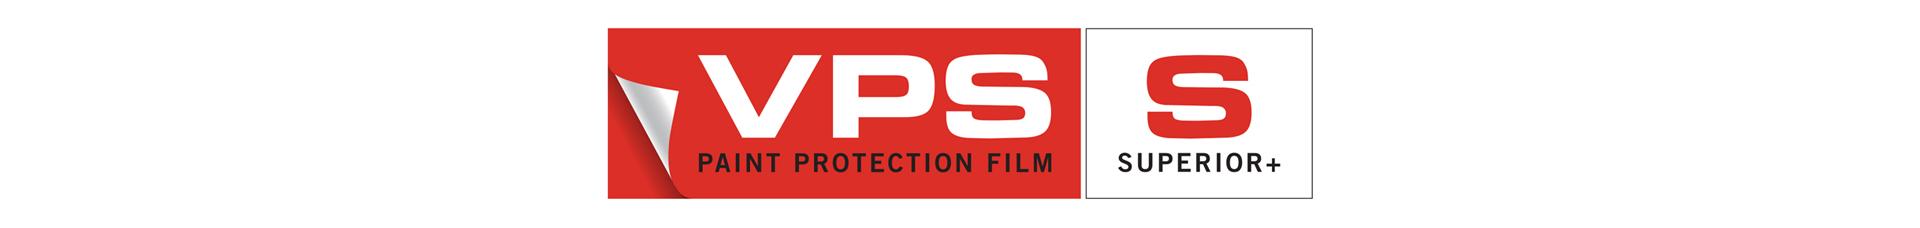 vps-superor-+-logo.jpg